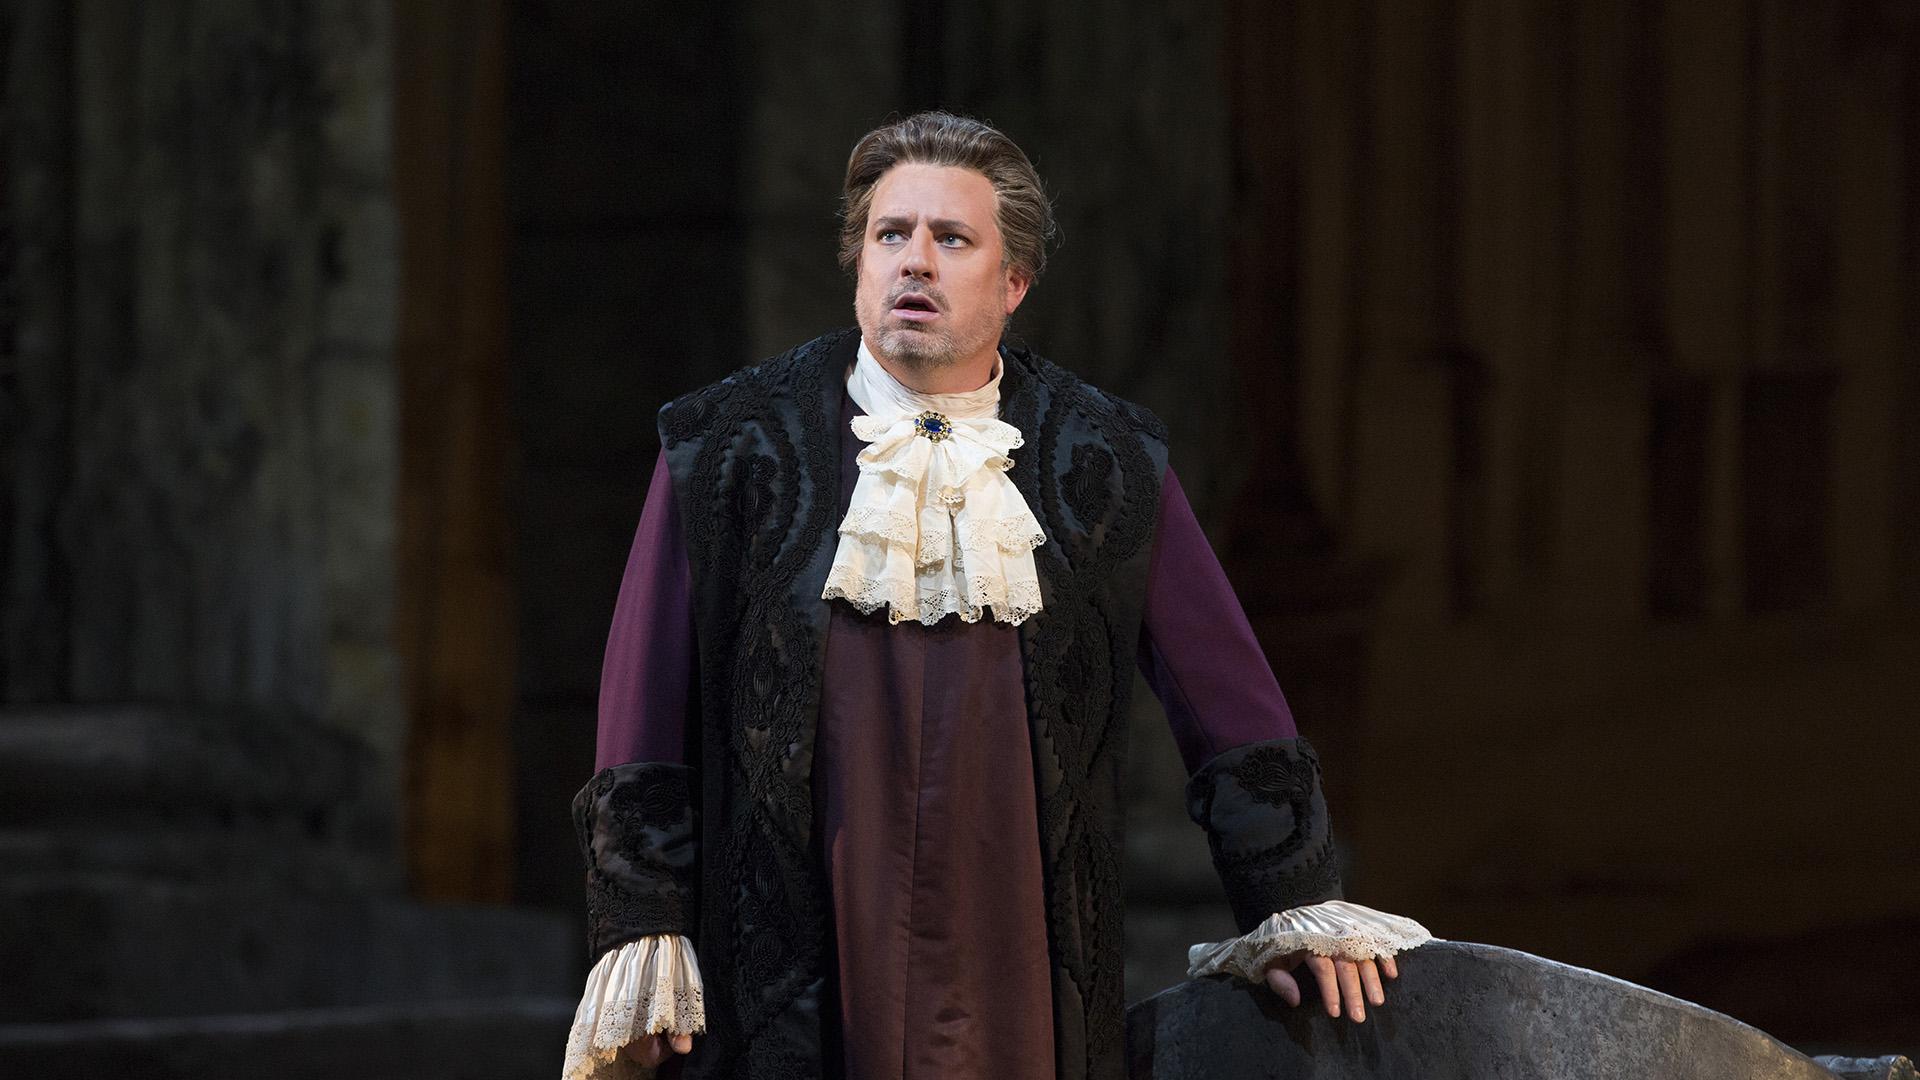 'Great Performances' to highlight Mozart's take on the Trojan War in 'Idomeneo'